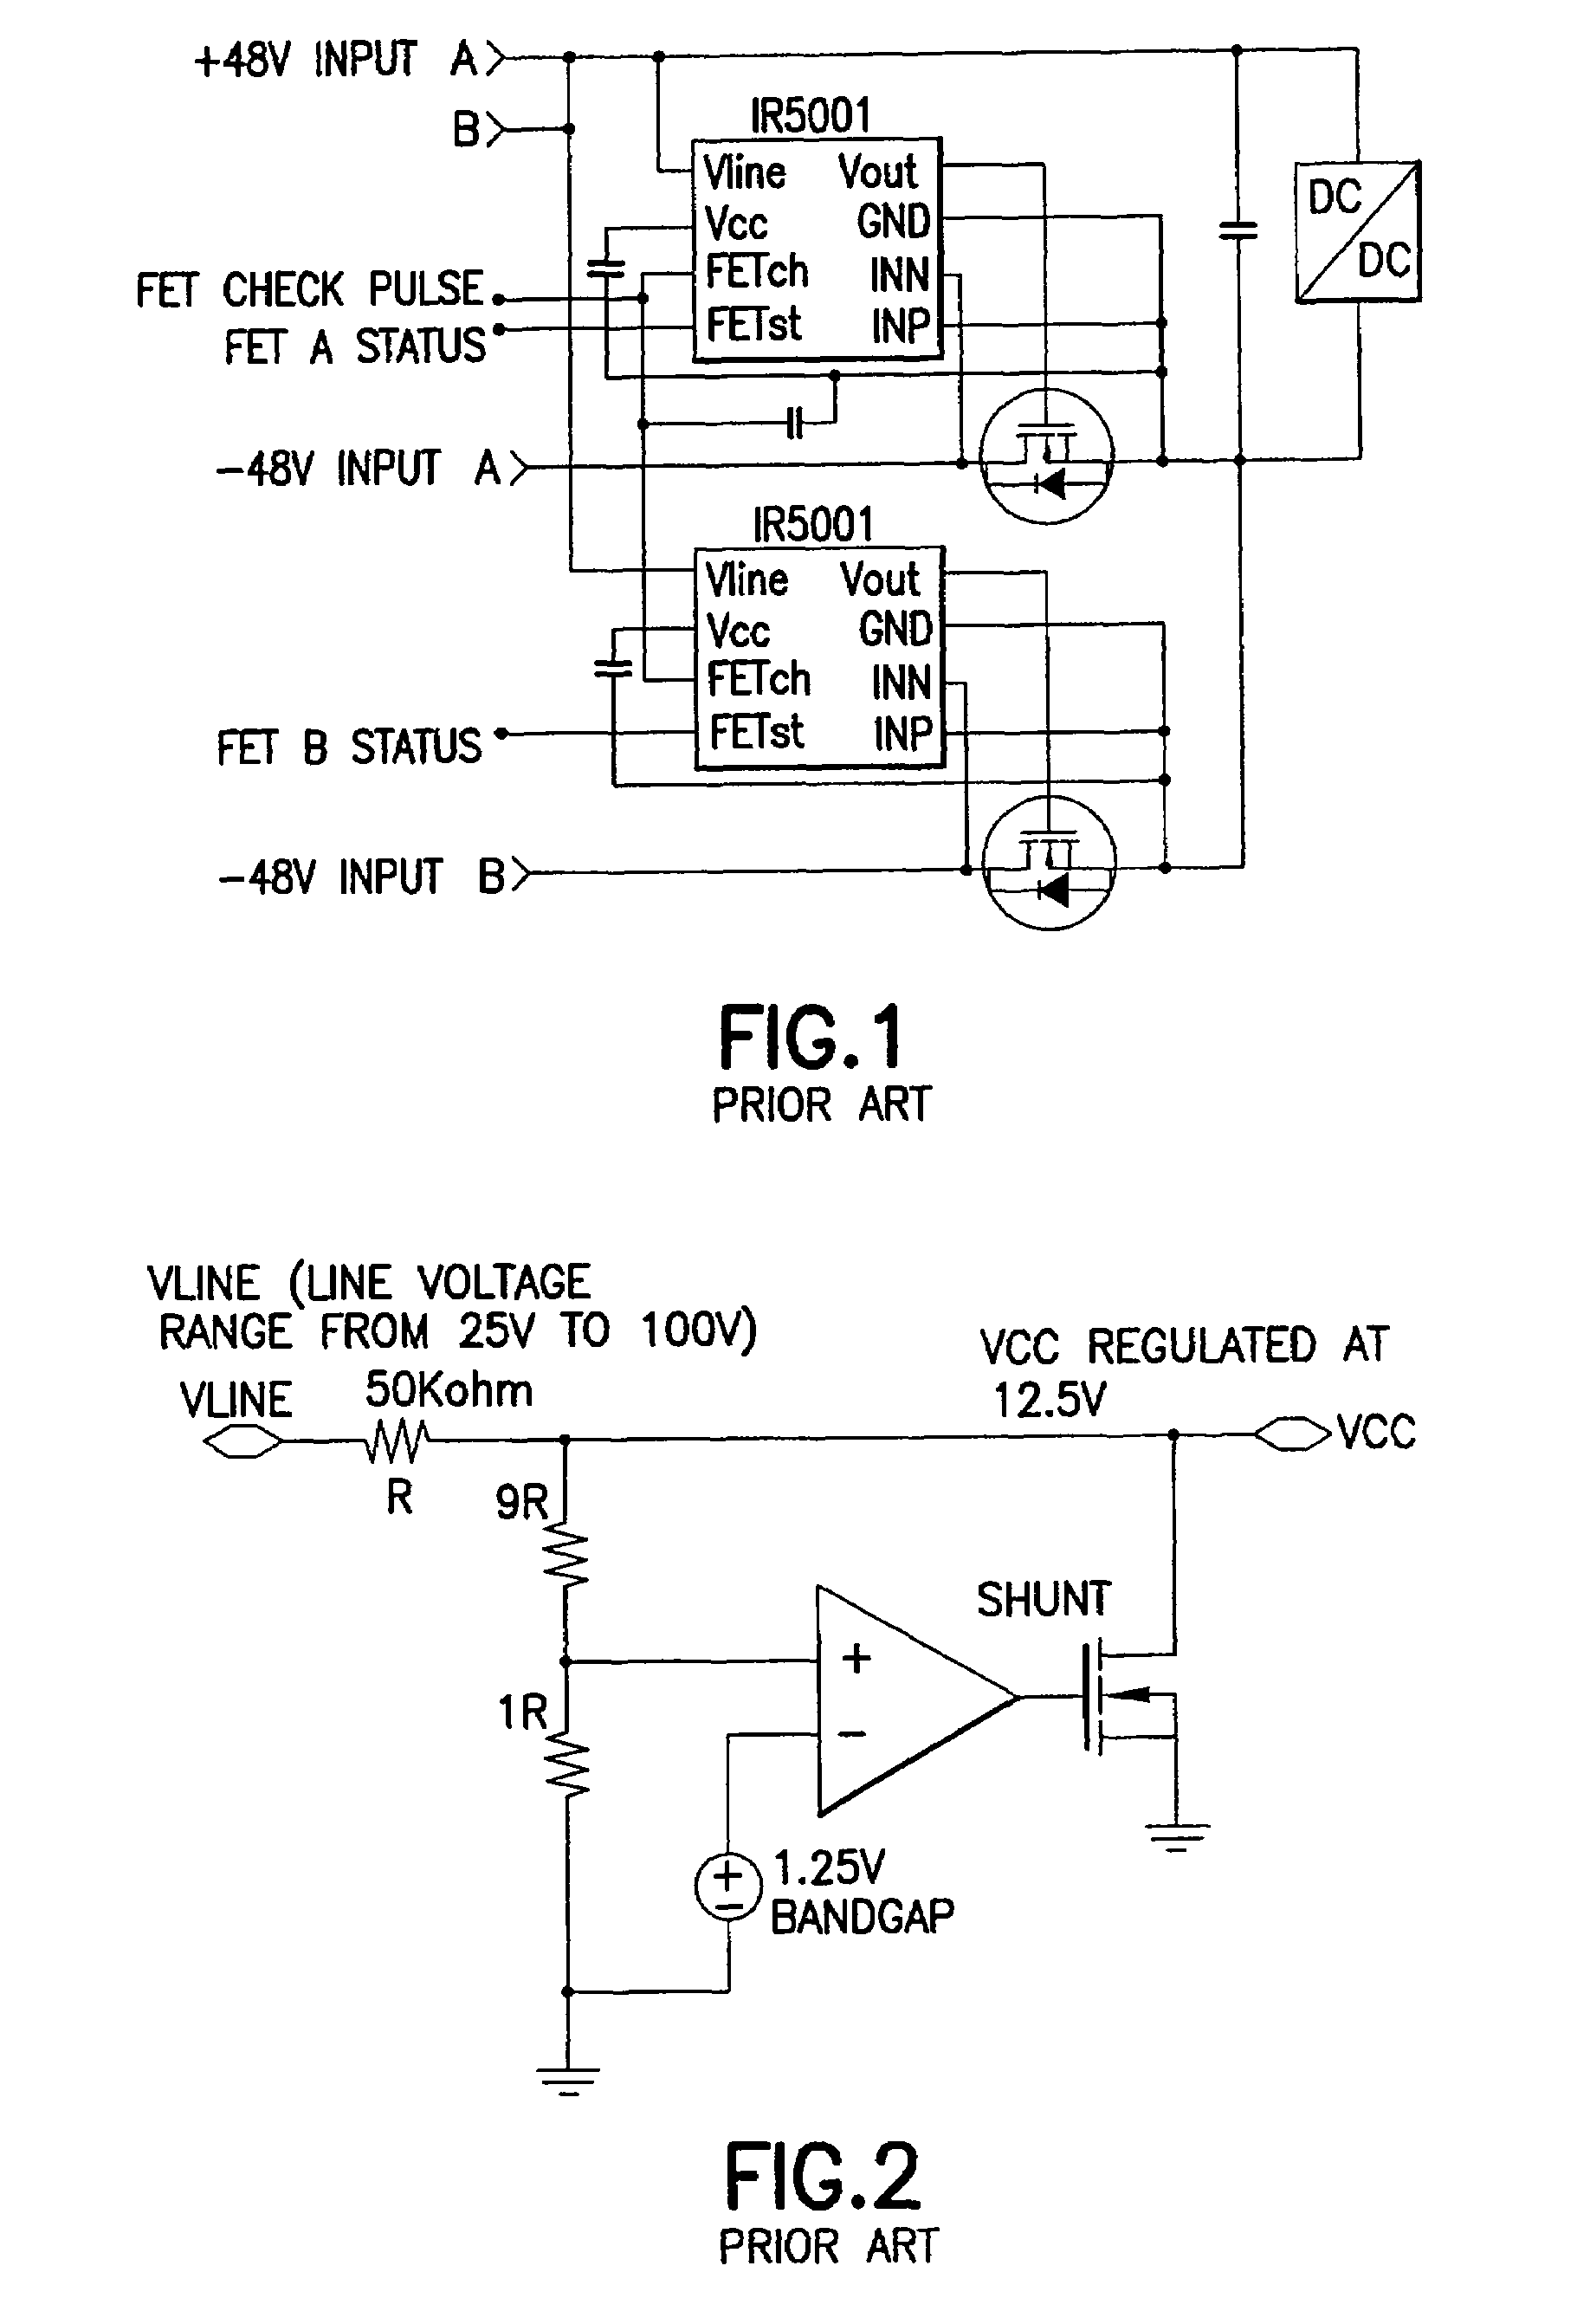 panhead voltage regulator wiring | wiring diagram database on ford 8n voltage  regulator wiring,